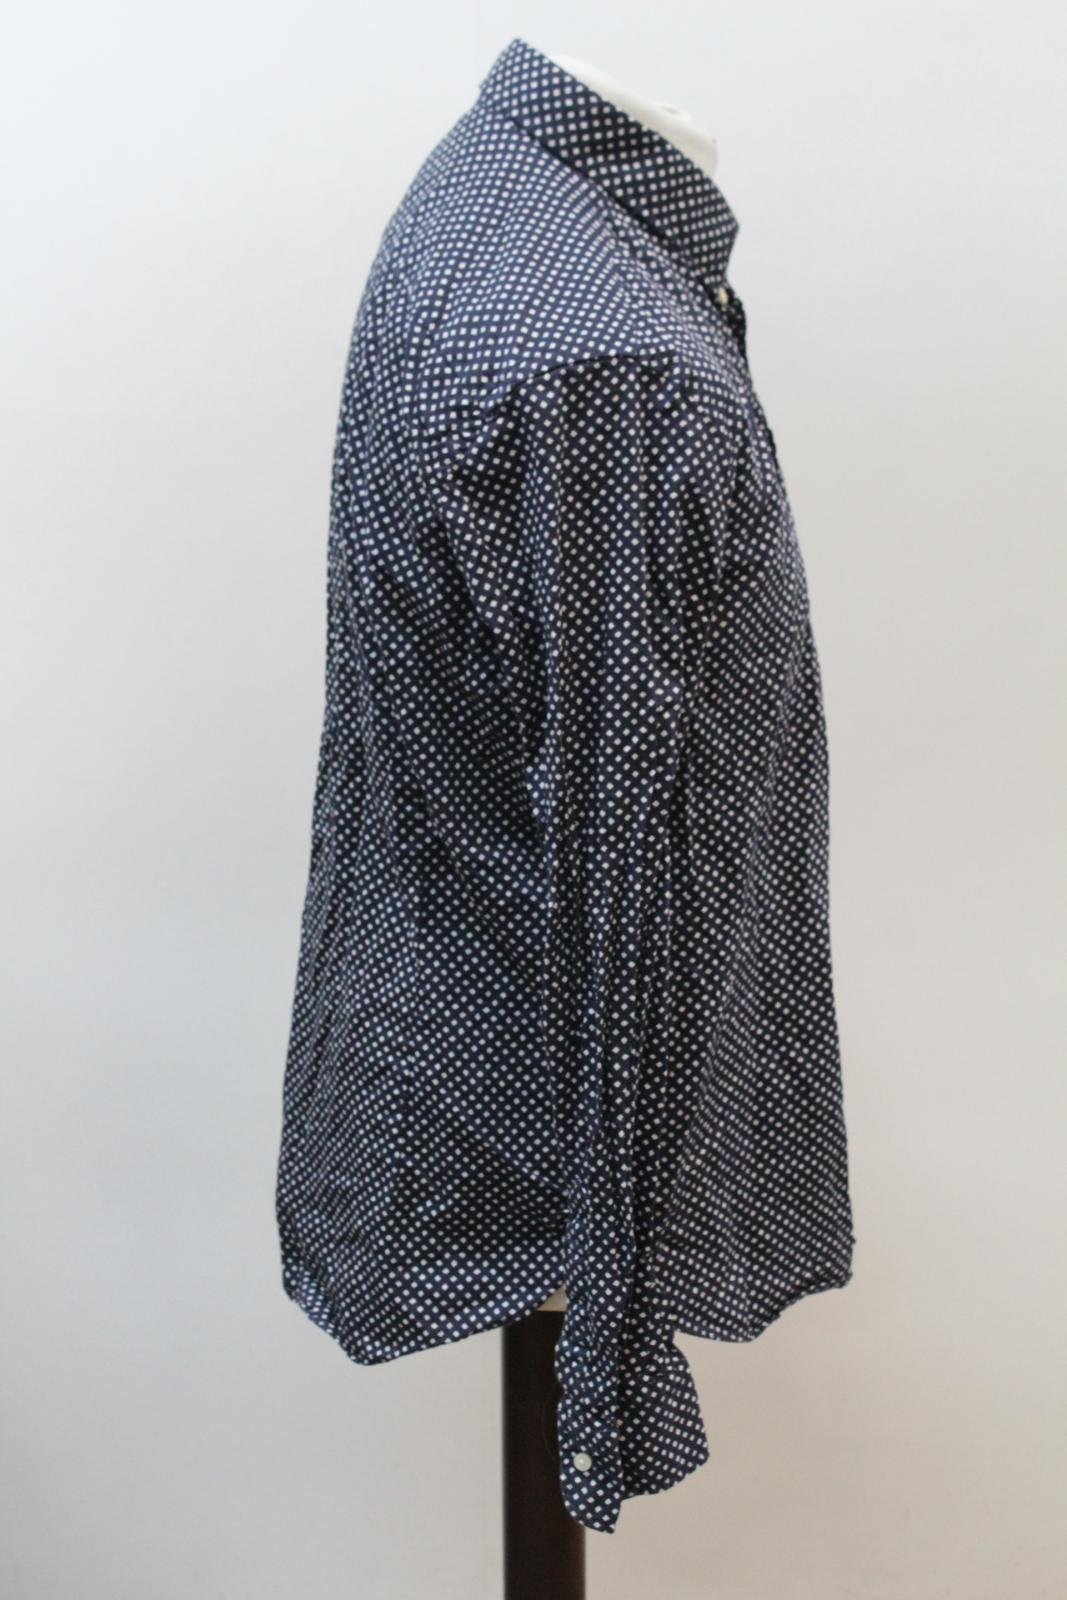 Massimo-Dutti-Para-hombres-Mangas-Largas-Azul-Marino-Marfil-Impreso-informal-camisa-tamano-XL miniatura 4